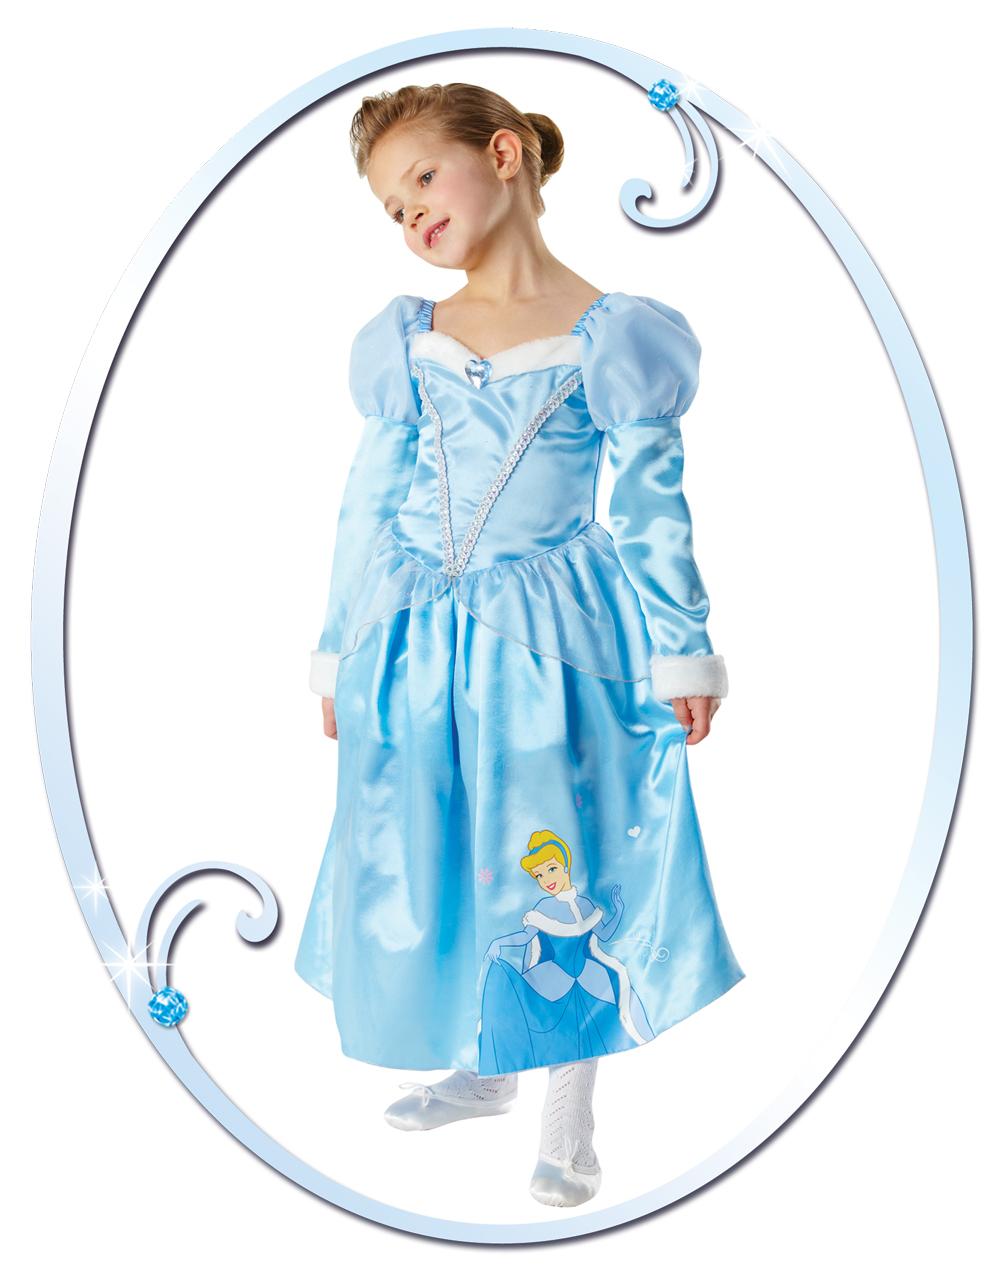 e5ad91f3bc03 Disney Cinderella Princess Costume   TV, Book and Film Costumes   Mega Fancy  Dress